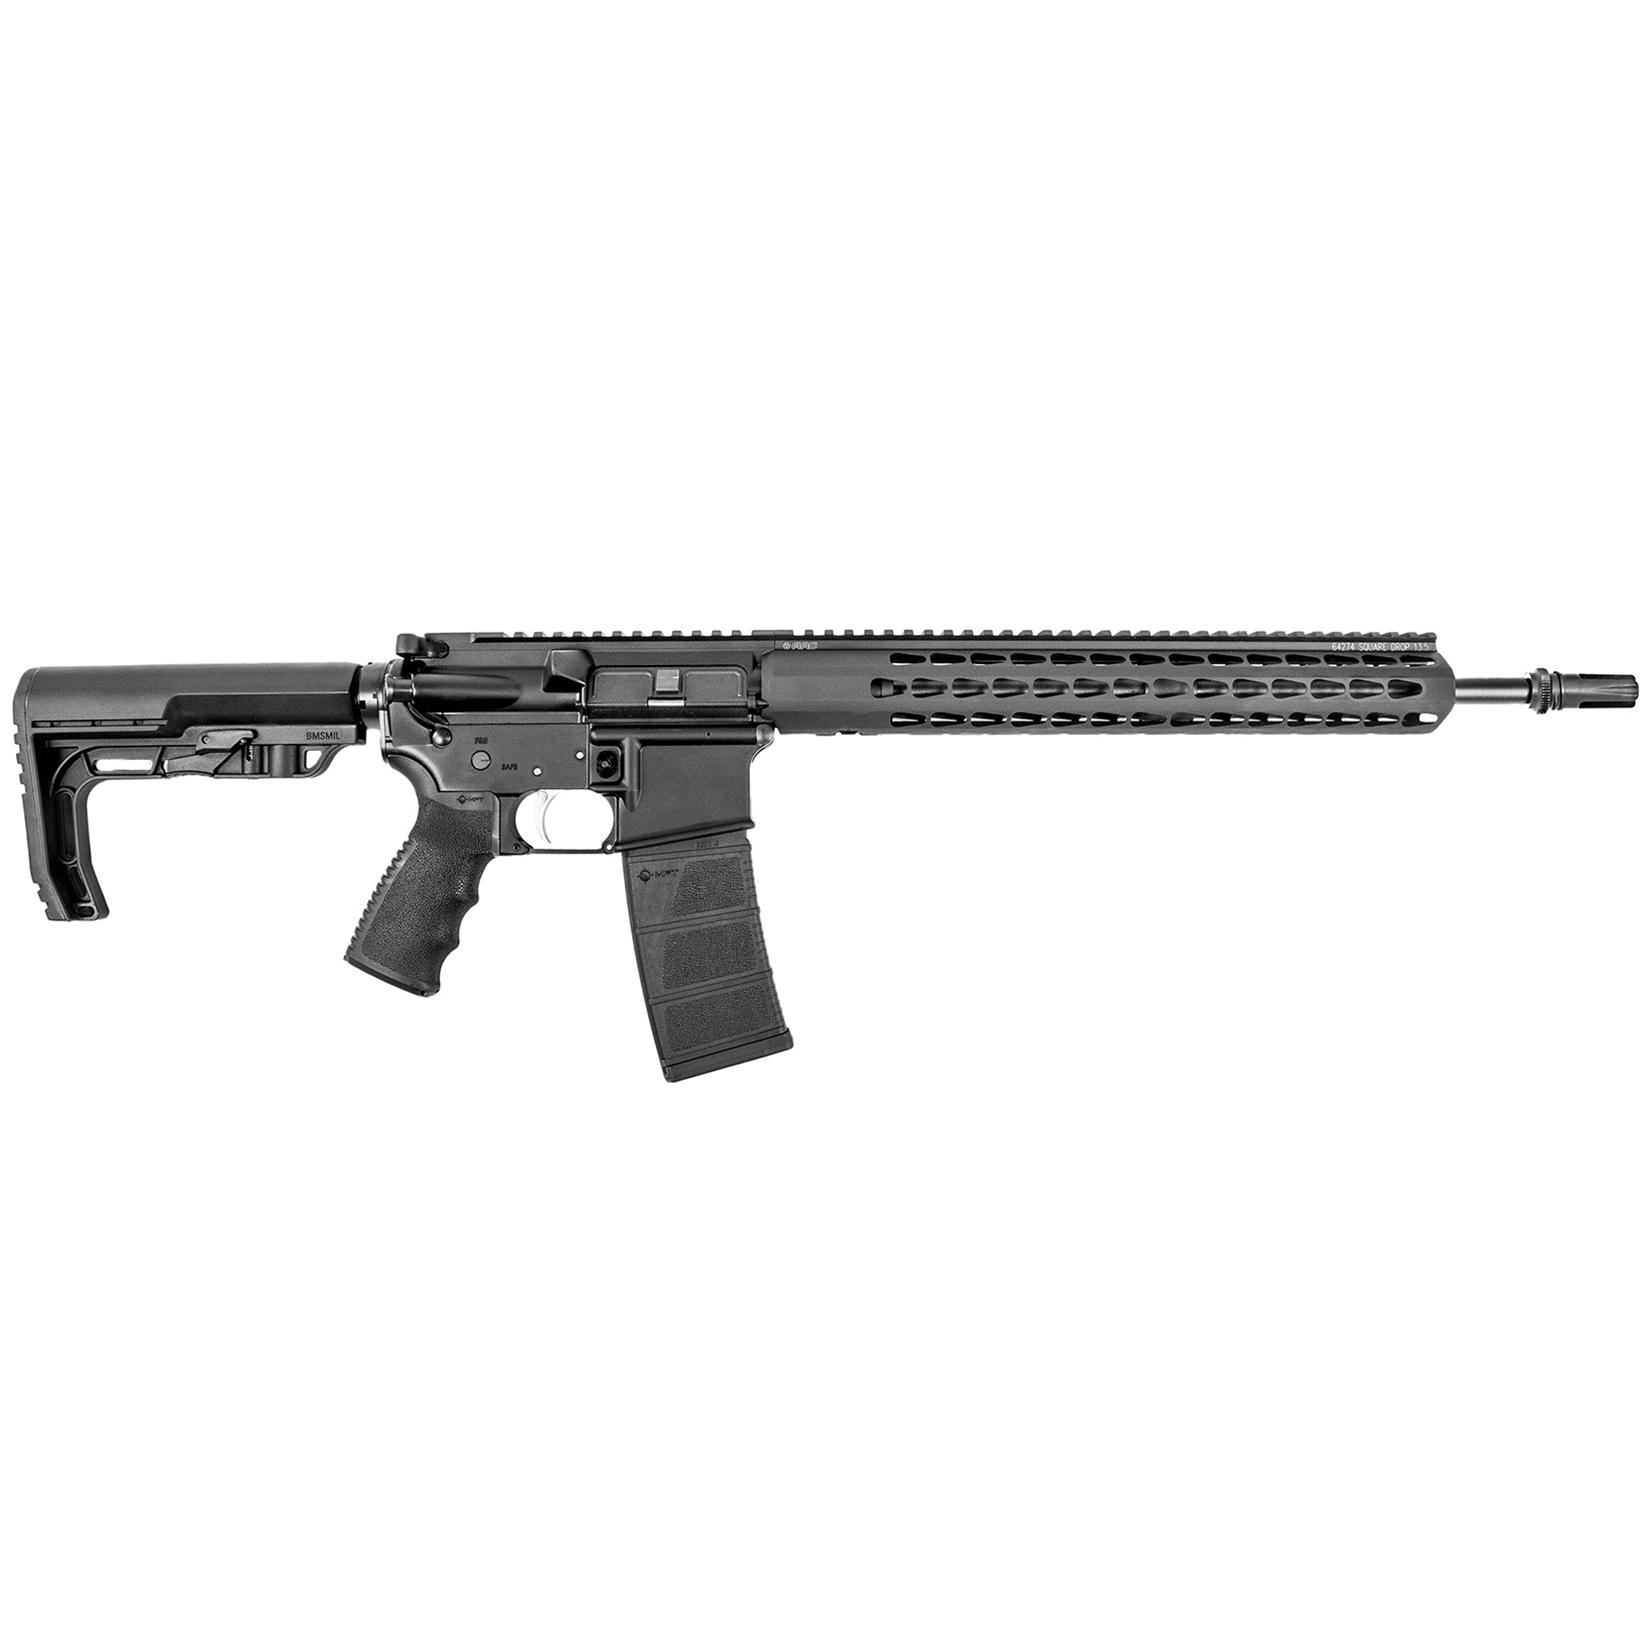 Bushmaster Minimalist-SD Carbine Centerfire Rifle, .223 Rem